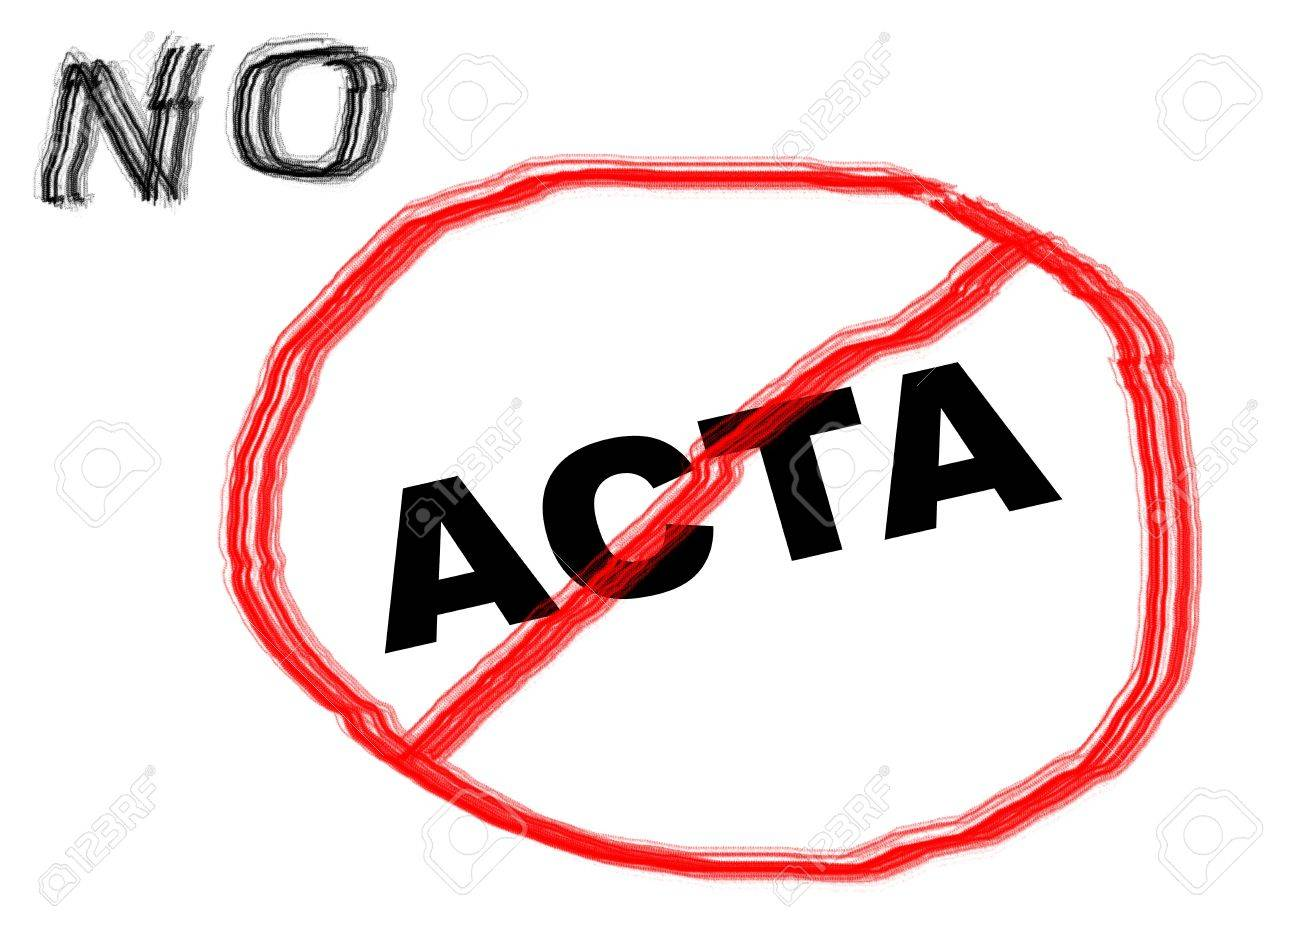 acta Stock Photo - 12639916